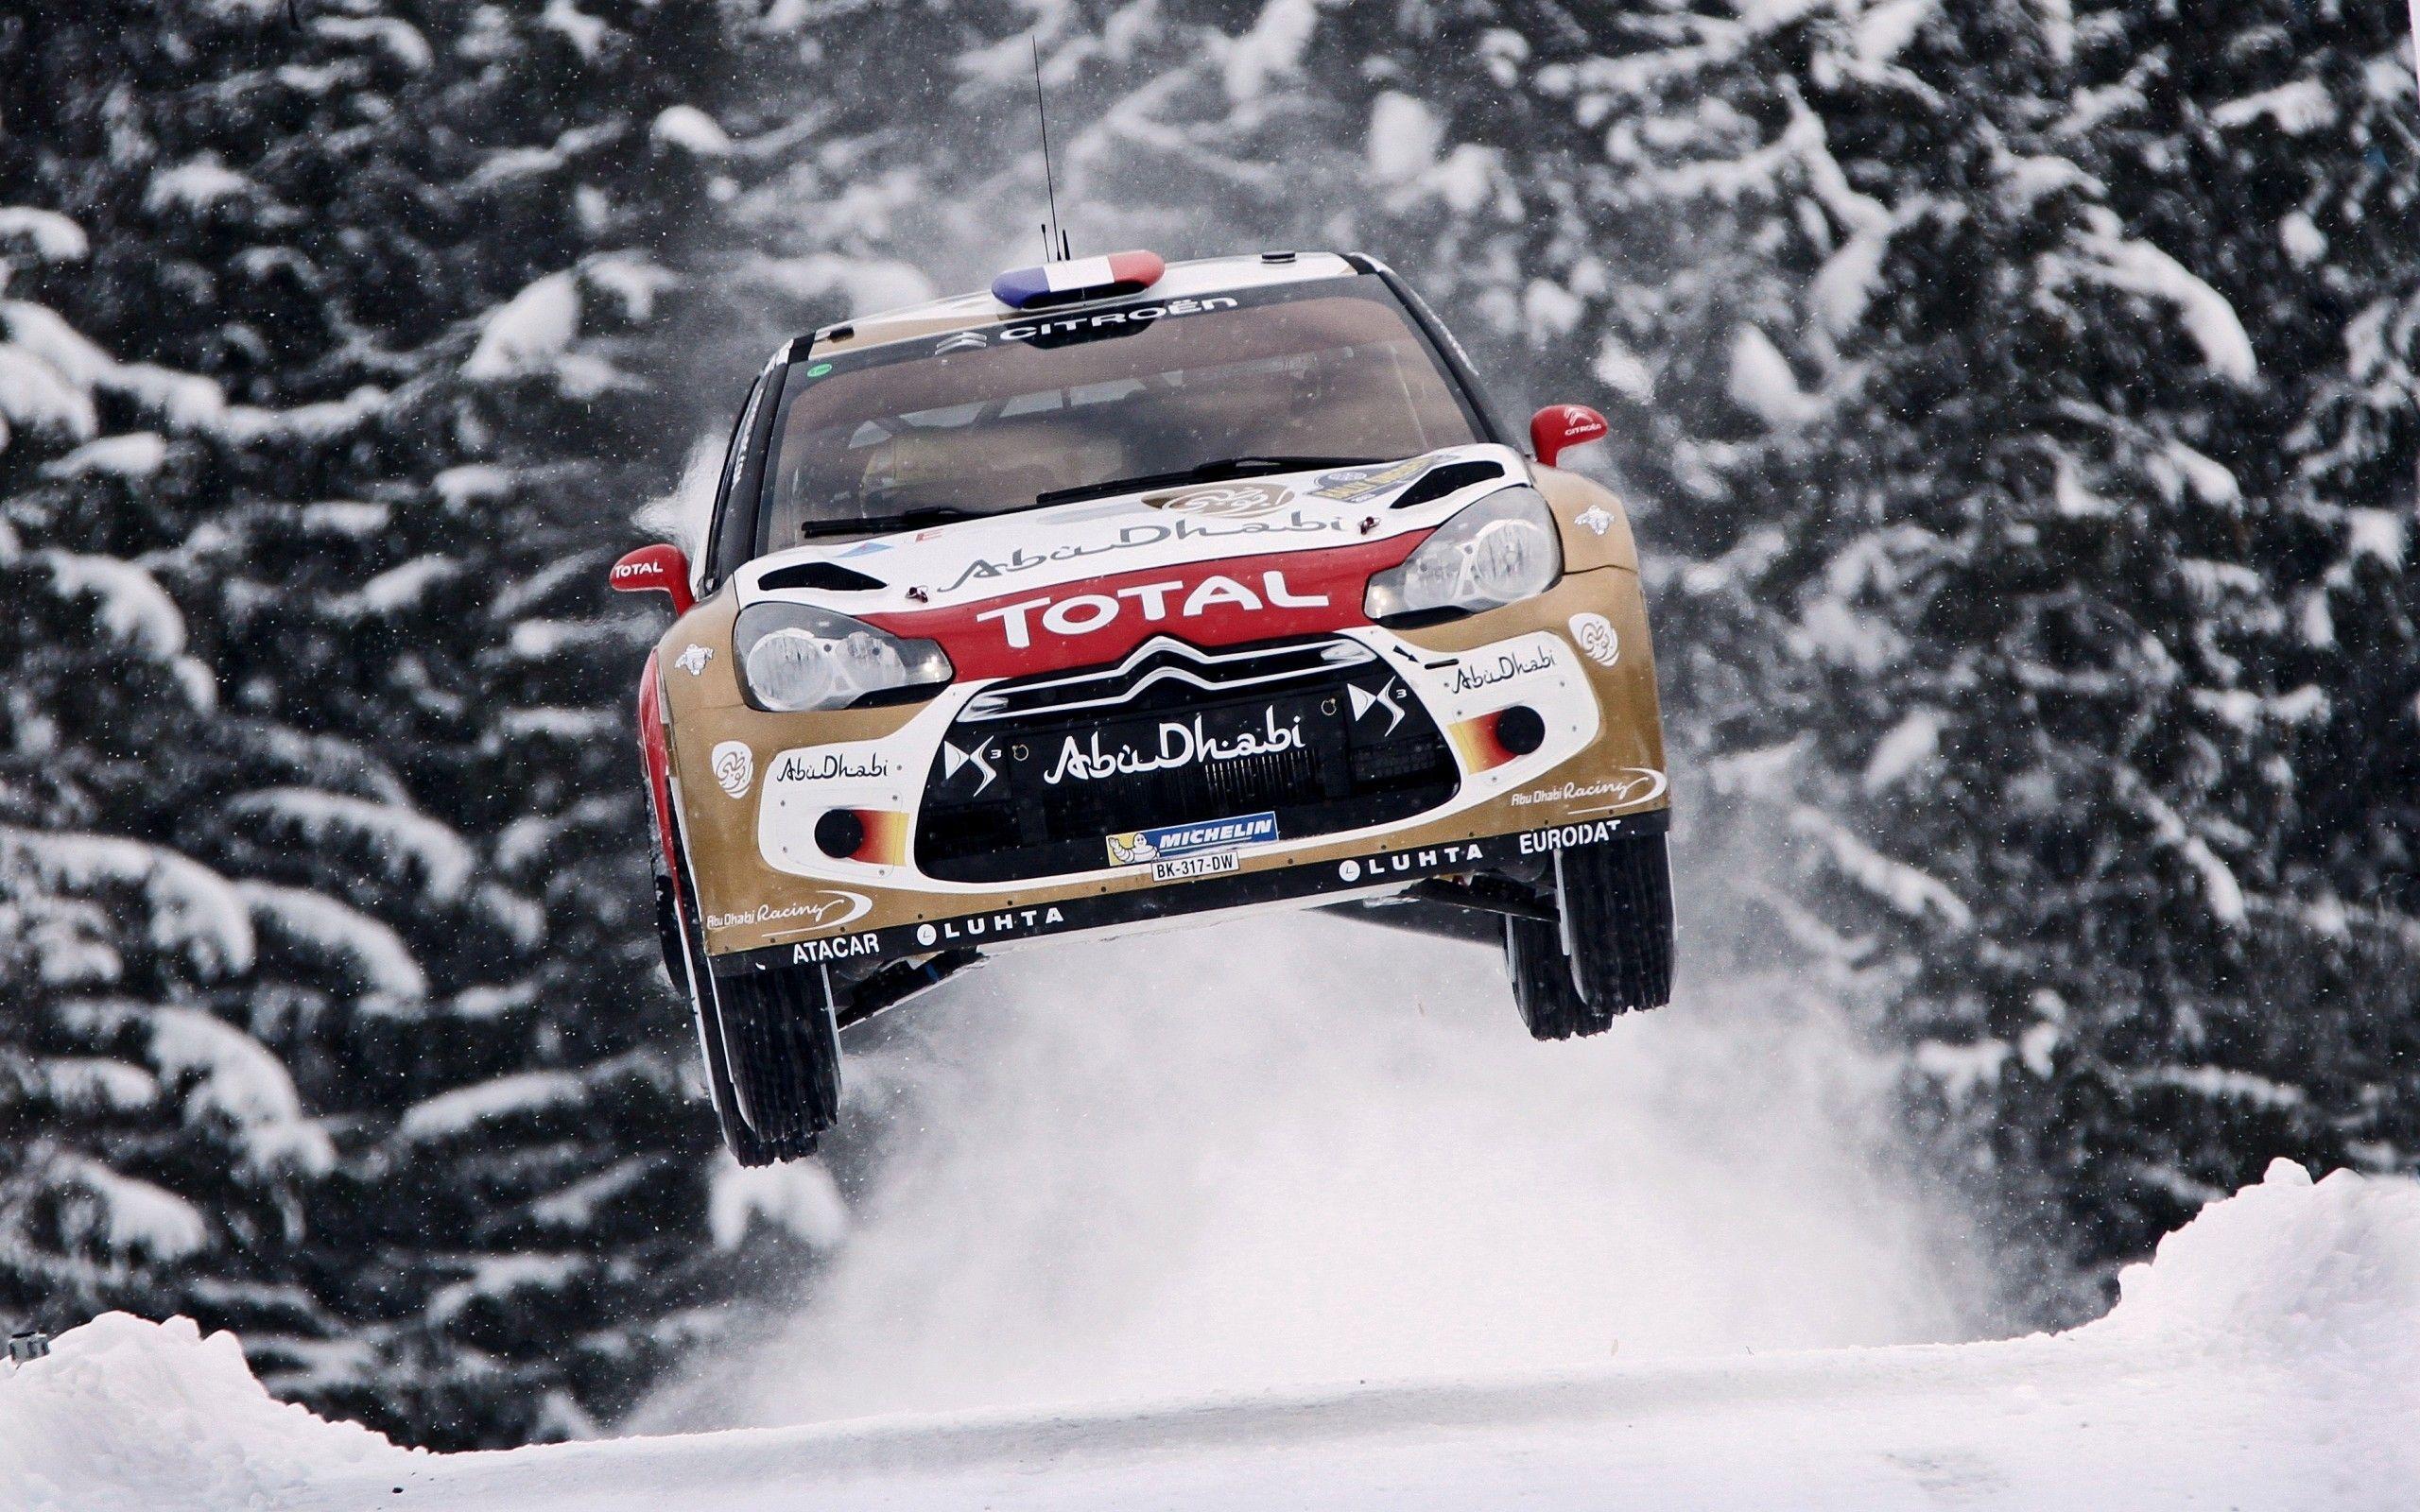 Loeb World Championship Car Jump Citroen Ds3 Wallpaper Veiculos